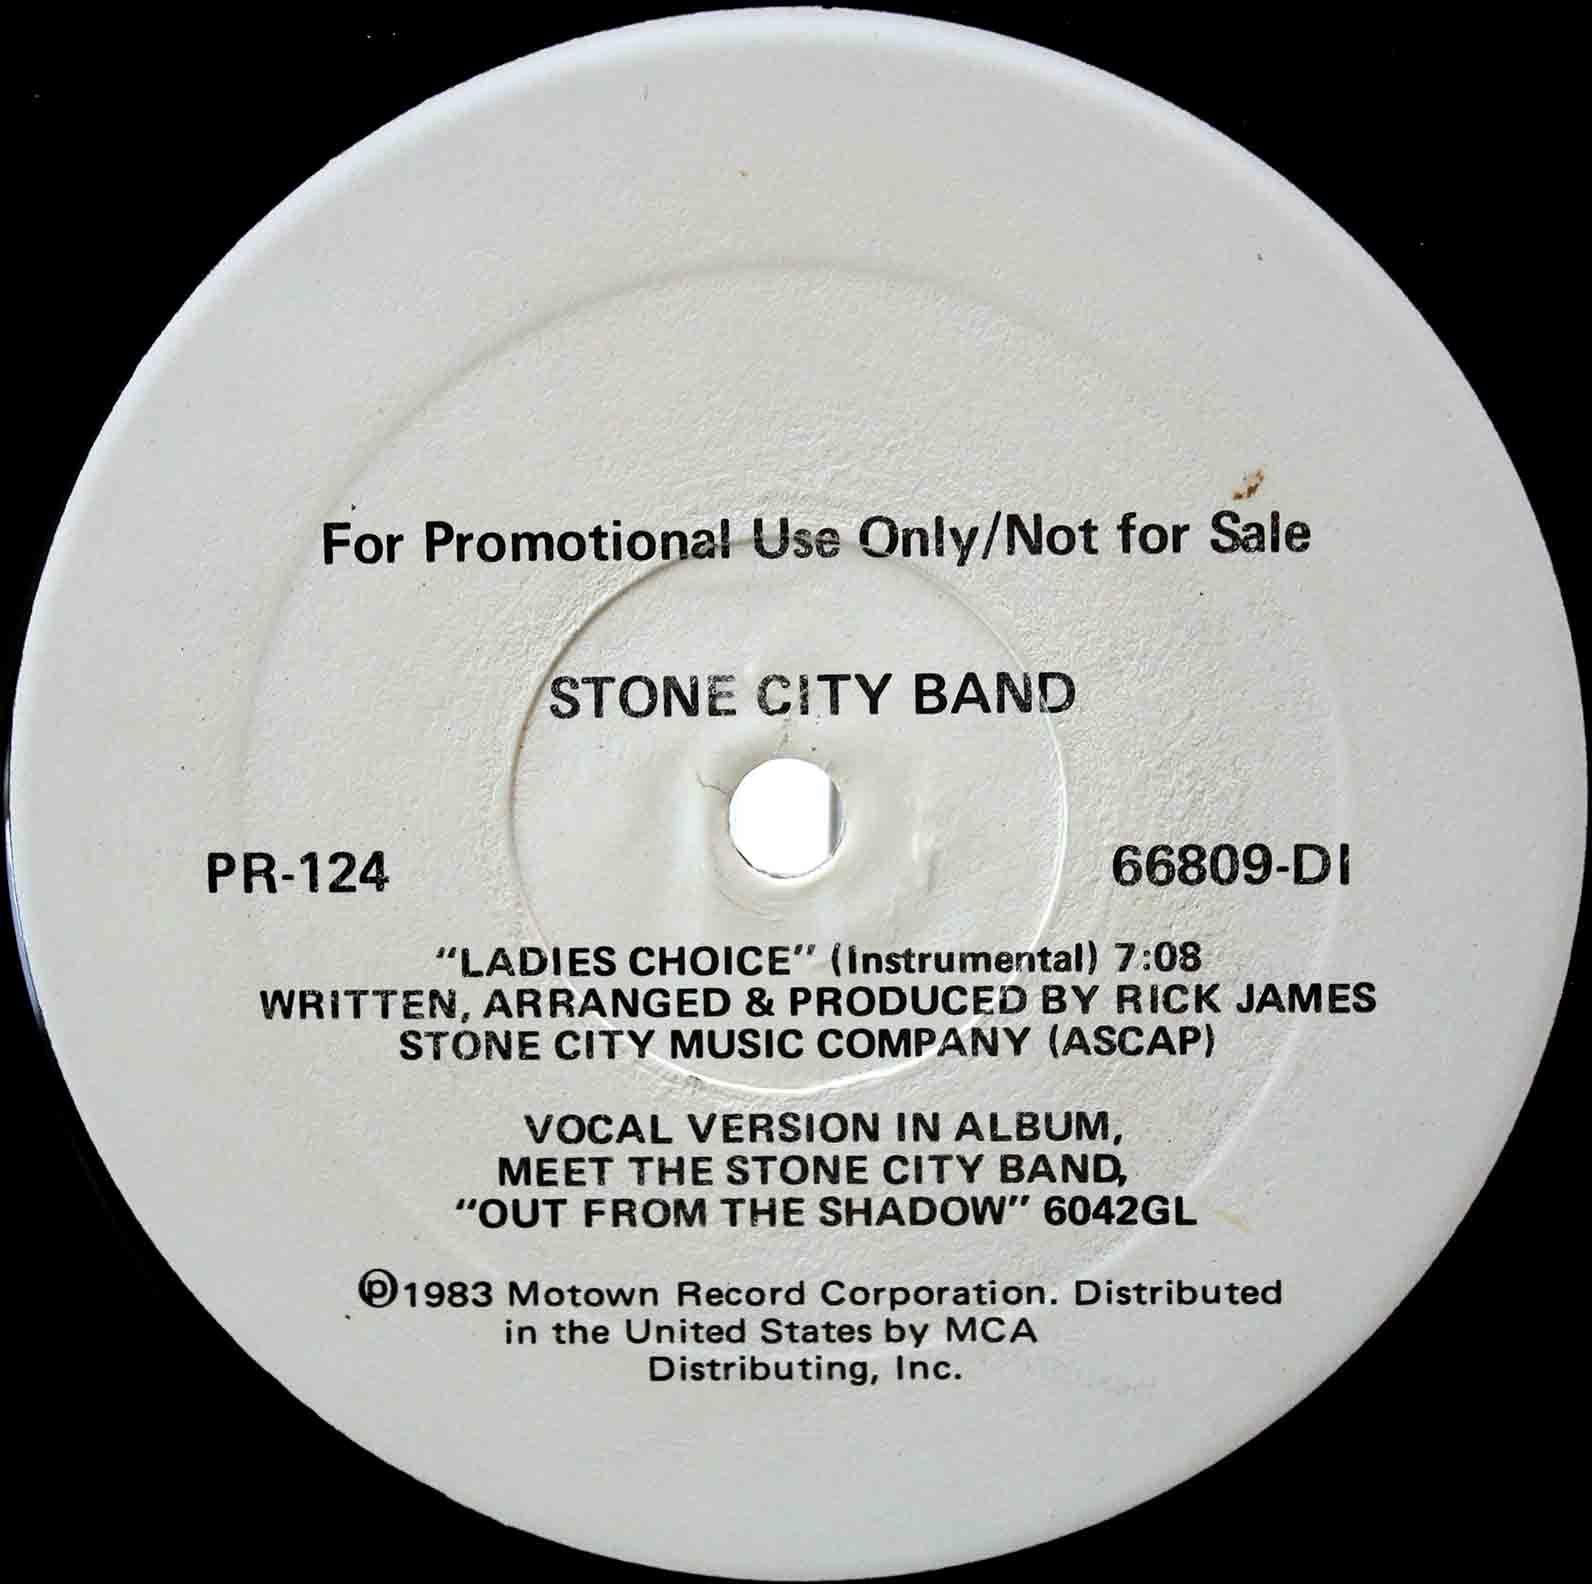 Stone City Band - Ladies Choice 04